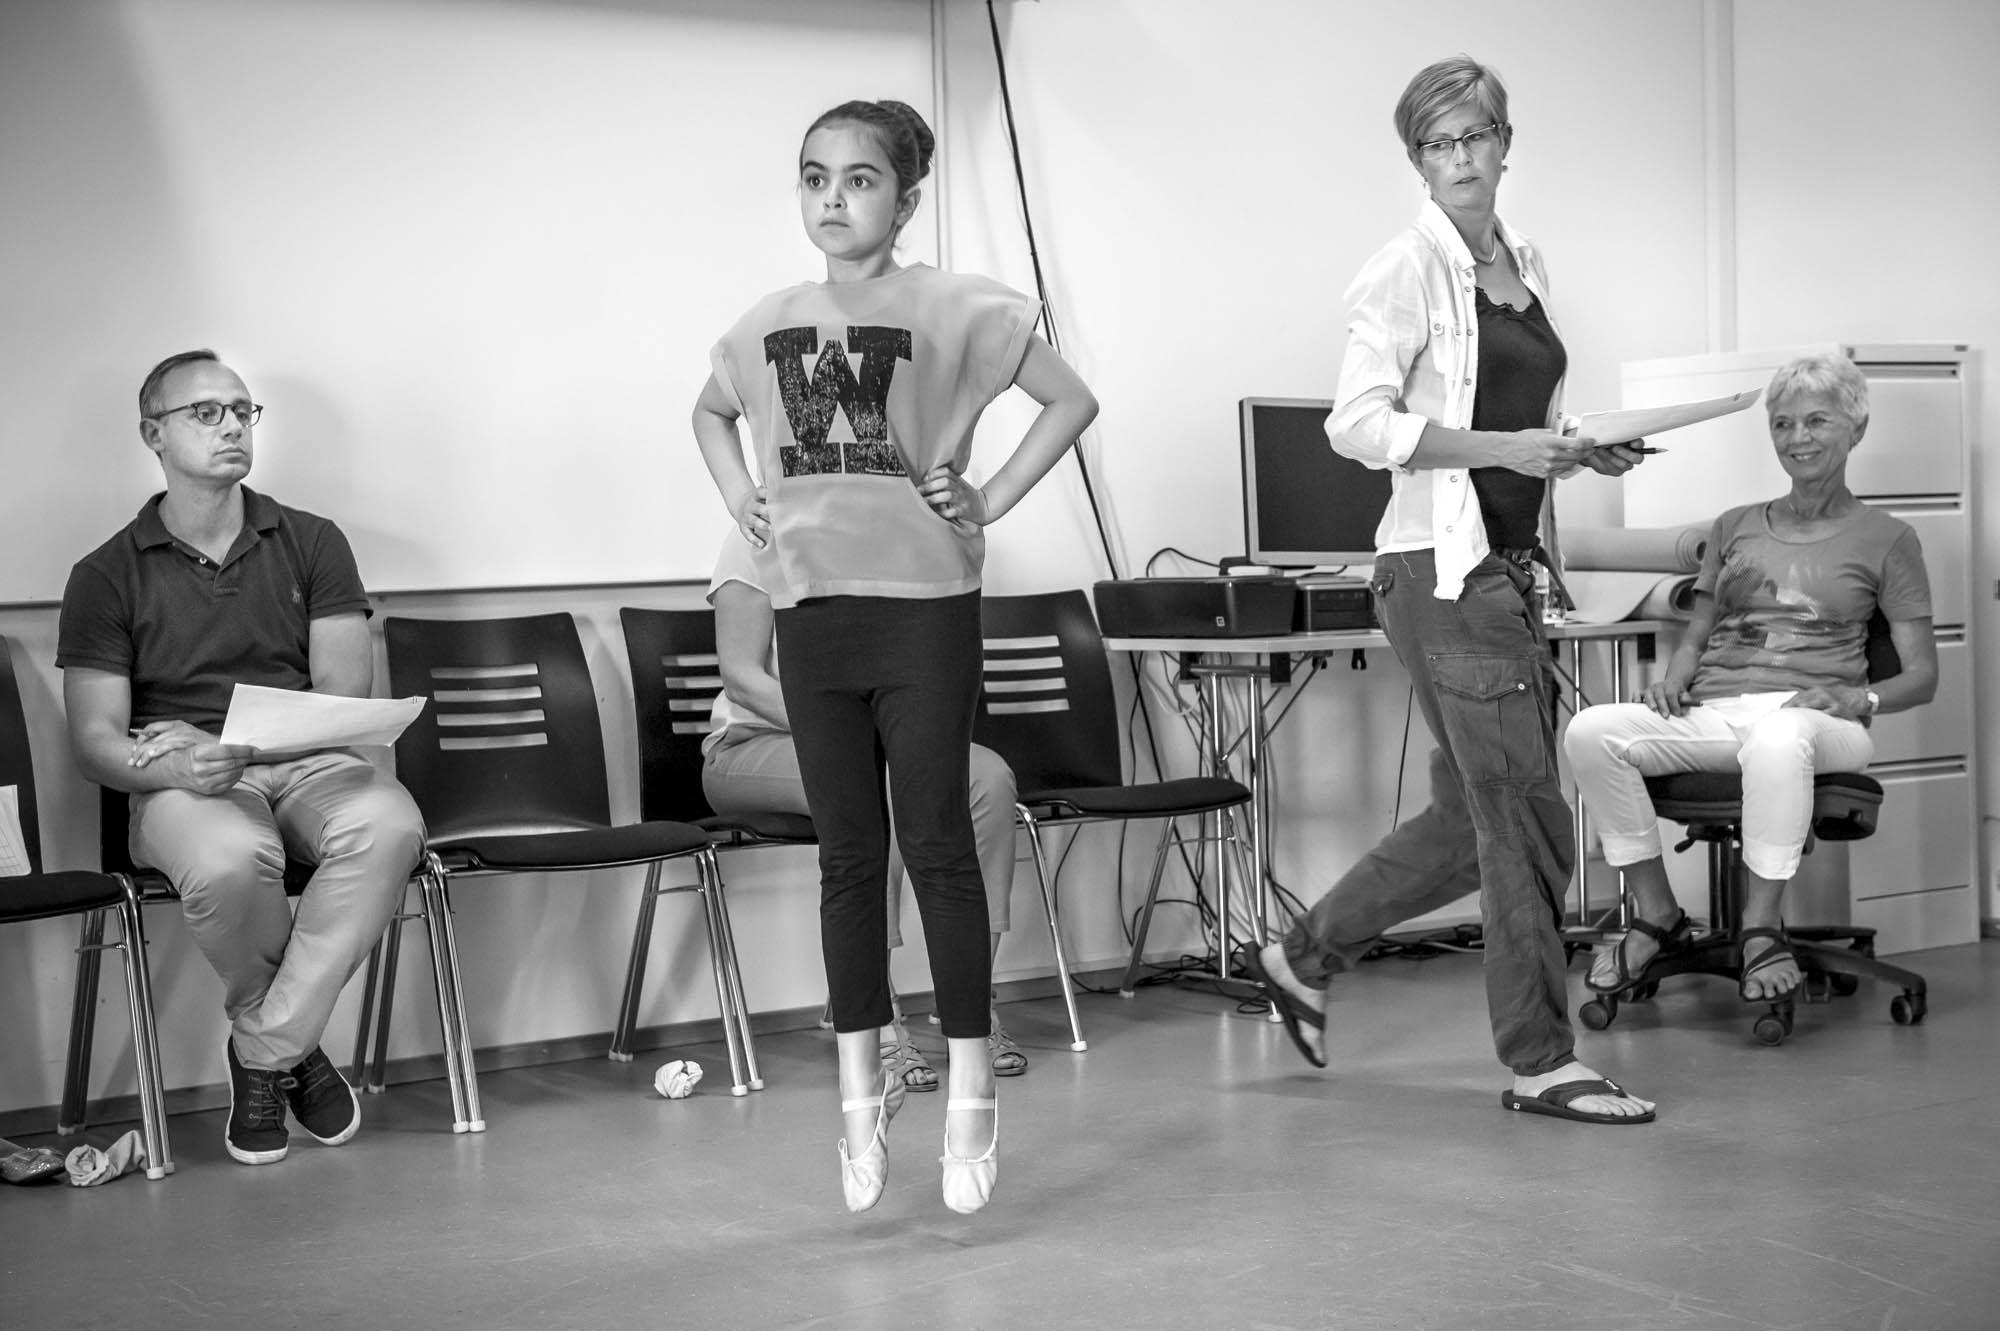 ballettest (6 of 10)